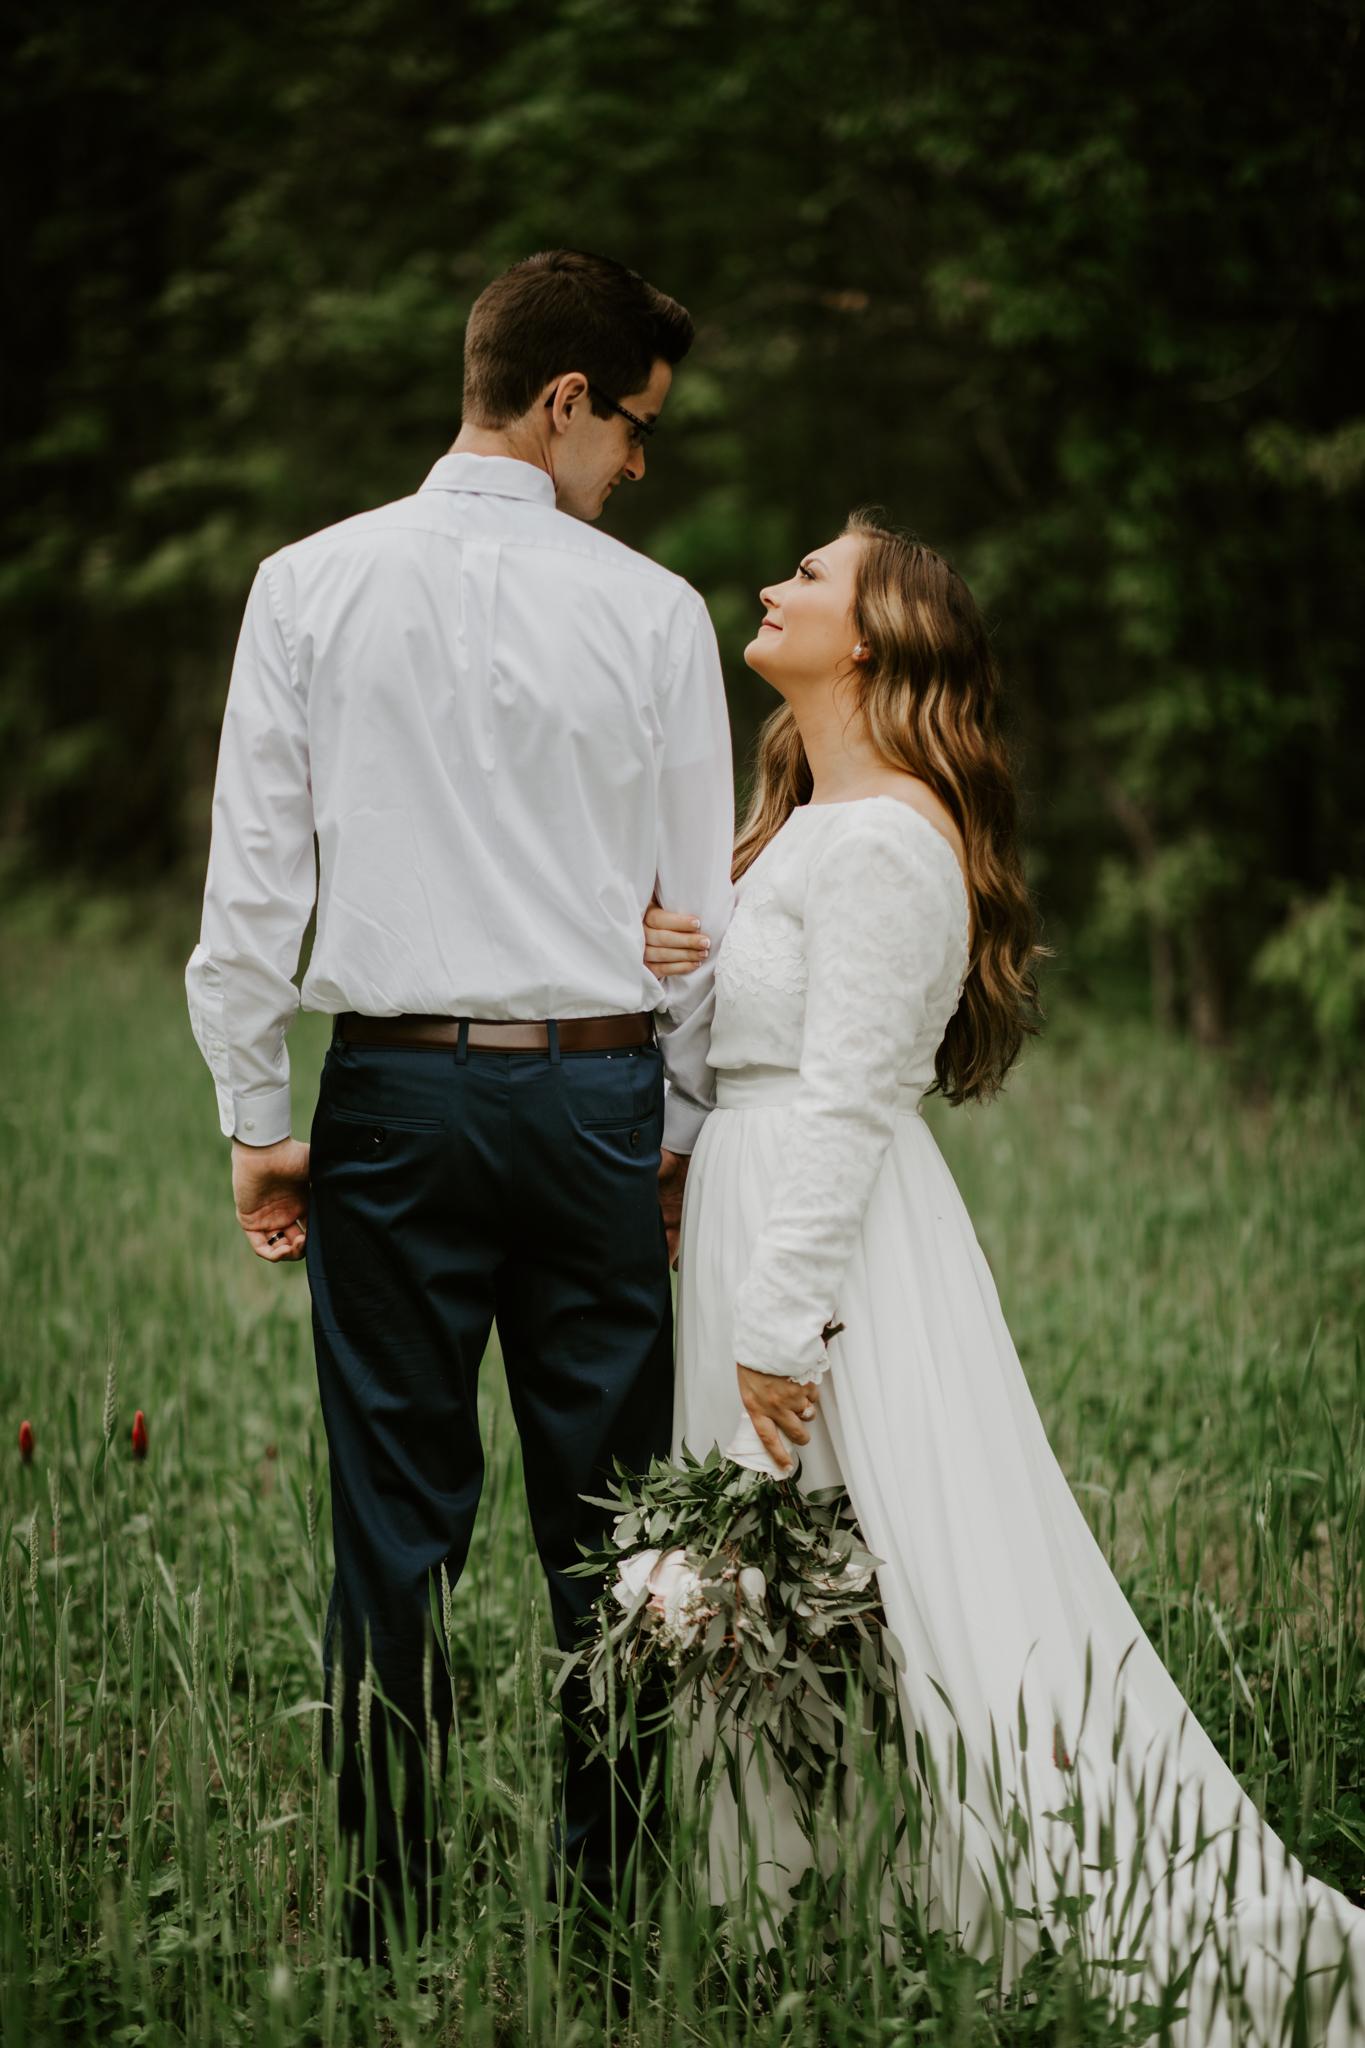 Lacey-Joe-Chattanooga-Nashville-Tennessee-Wedding-Elopement-Photographer-177.jpg